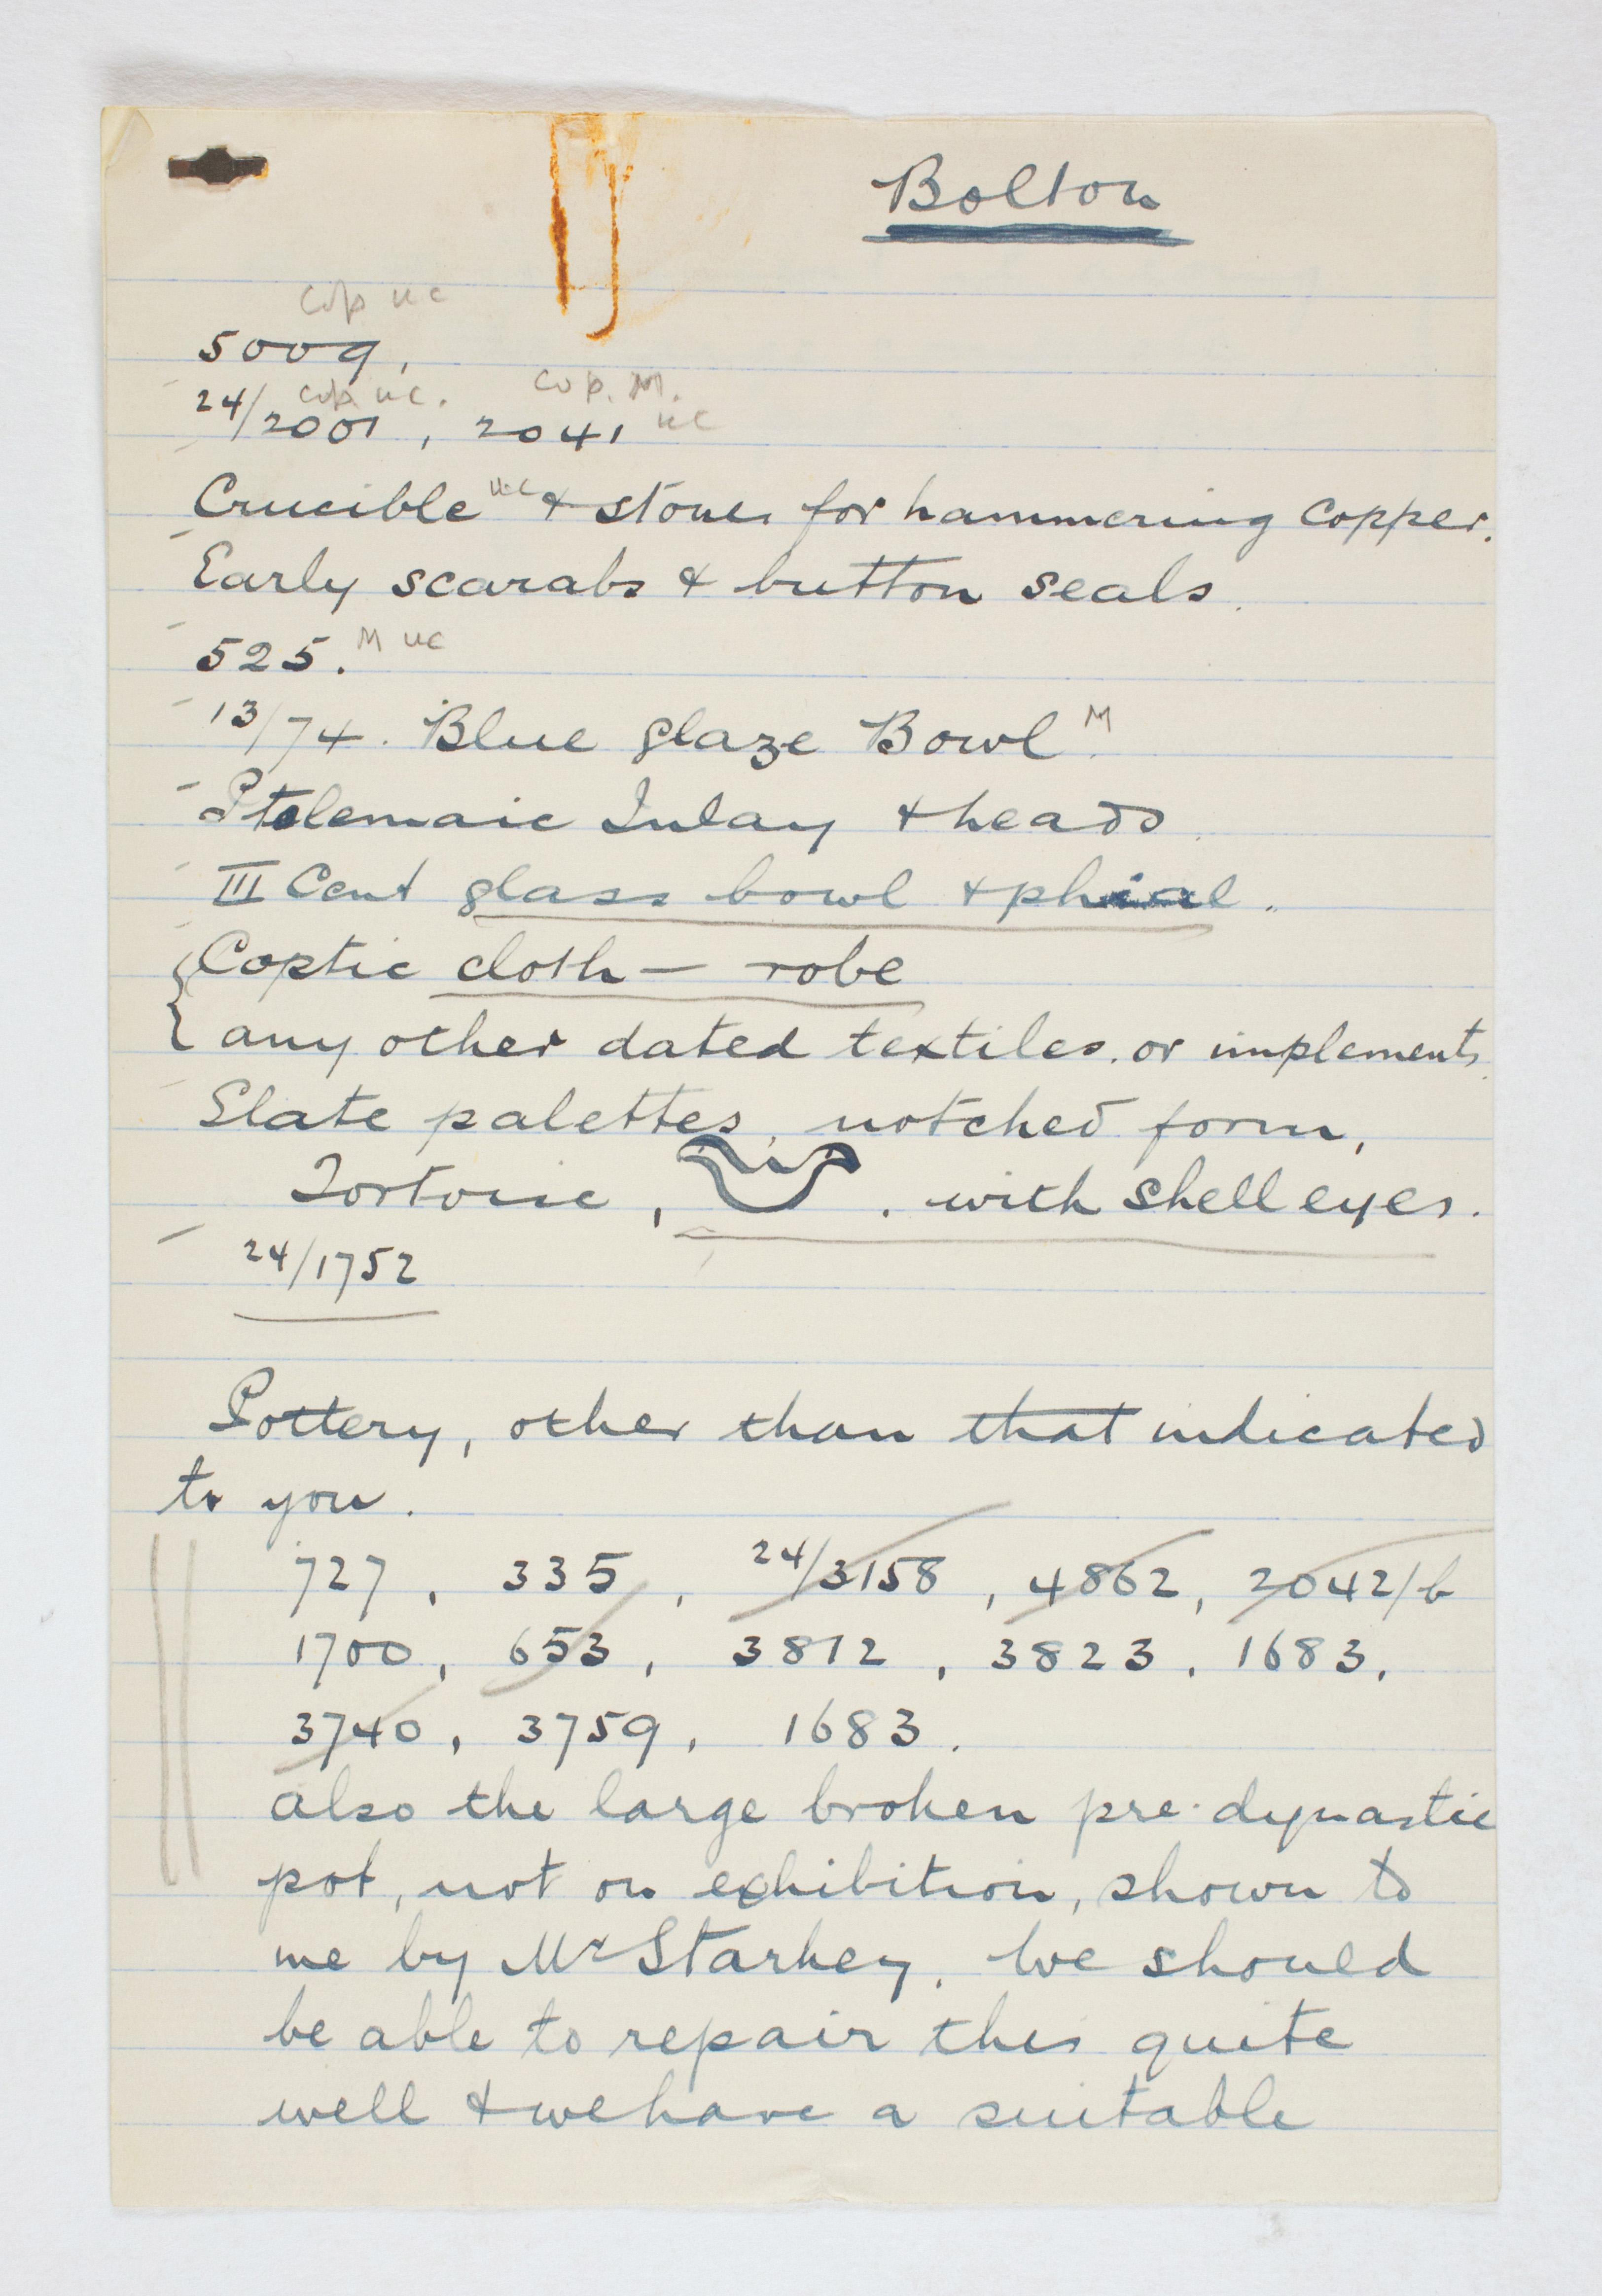 1923-24 Qau el-Kebir, Hemamieh Individual institution list PMA/WFP1/D/27/5.1